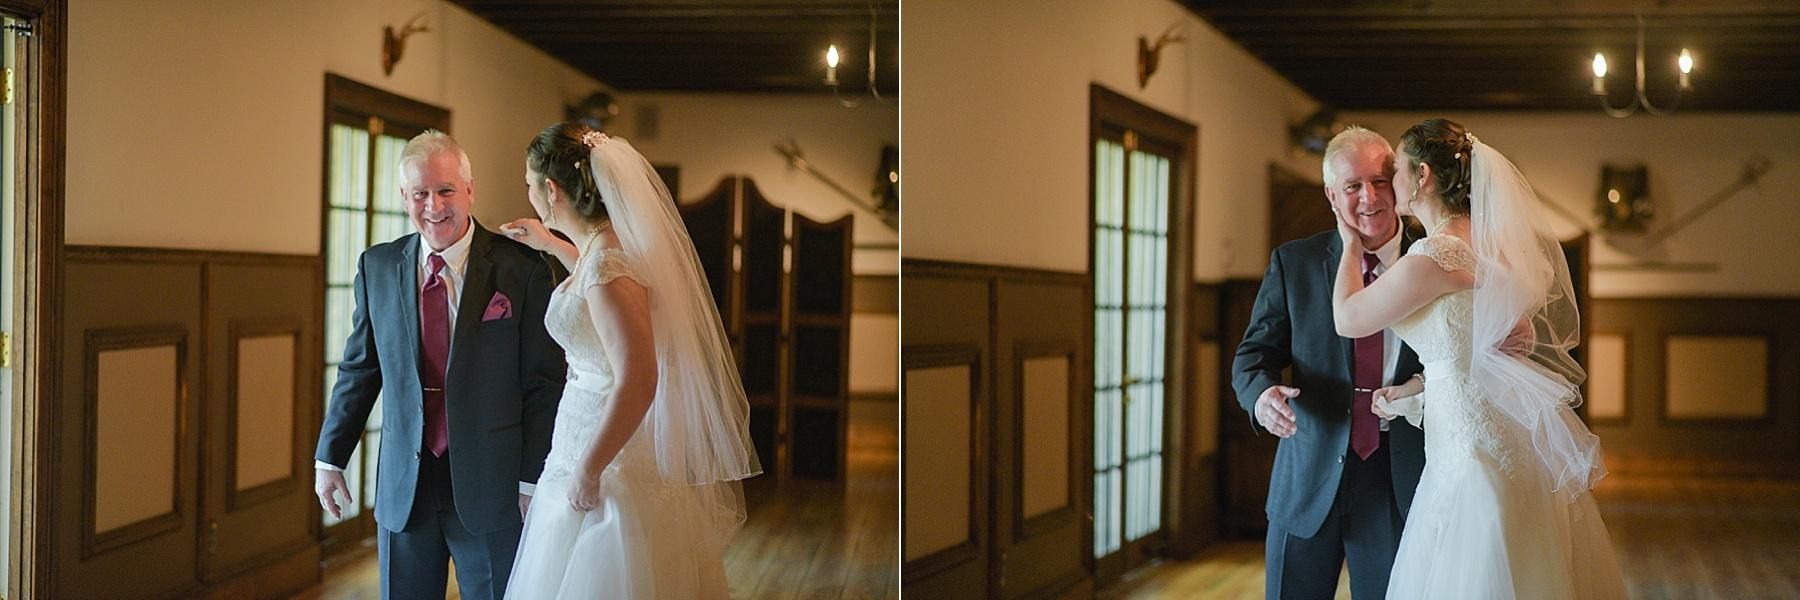 williamsburg-winery-wedding_0017.jpg